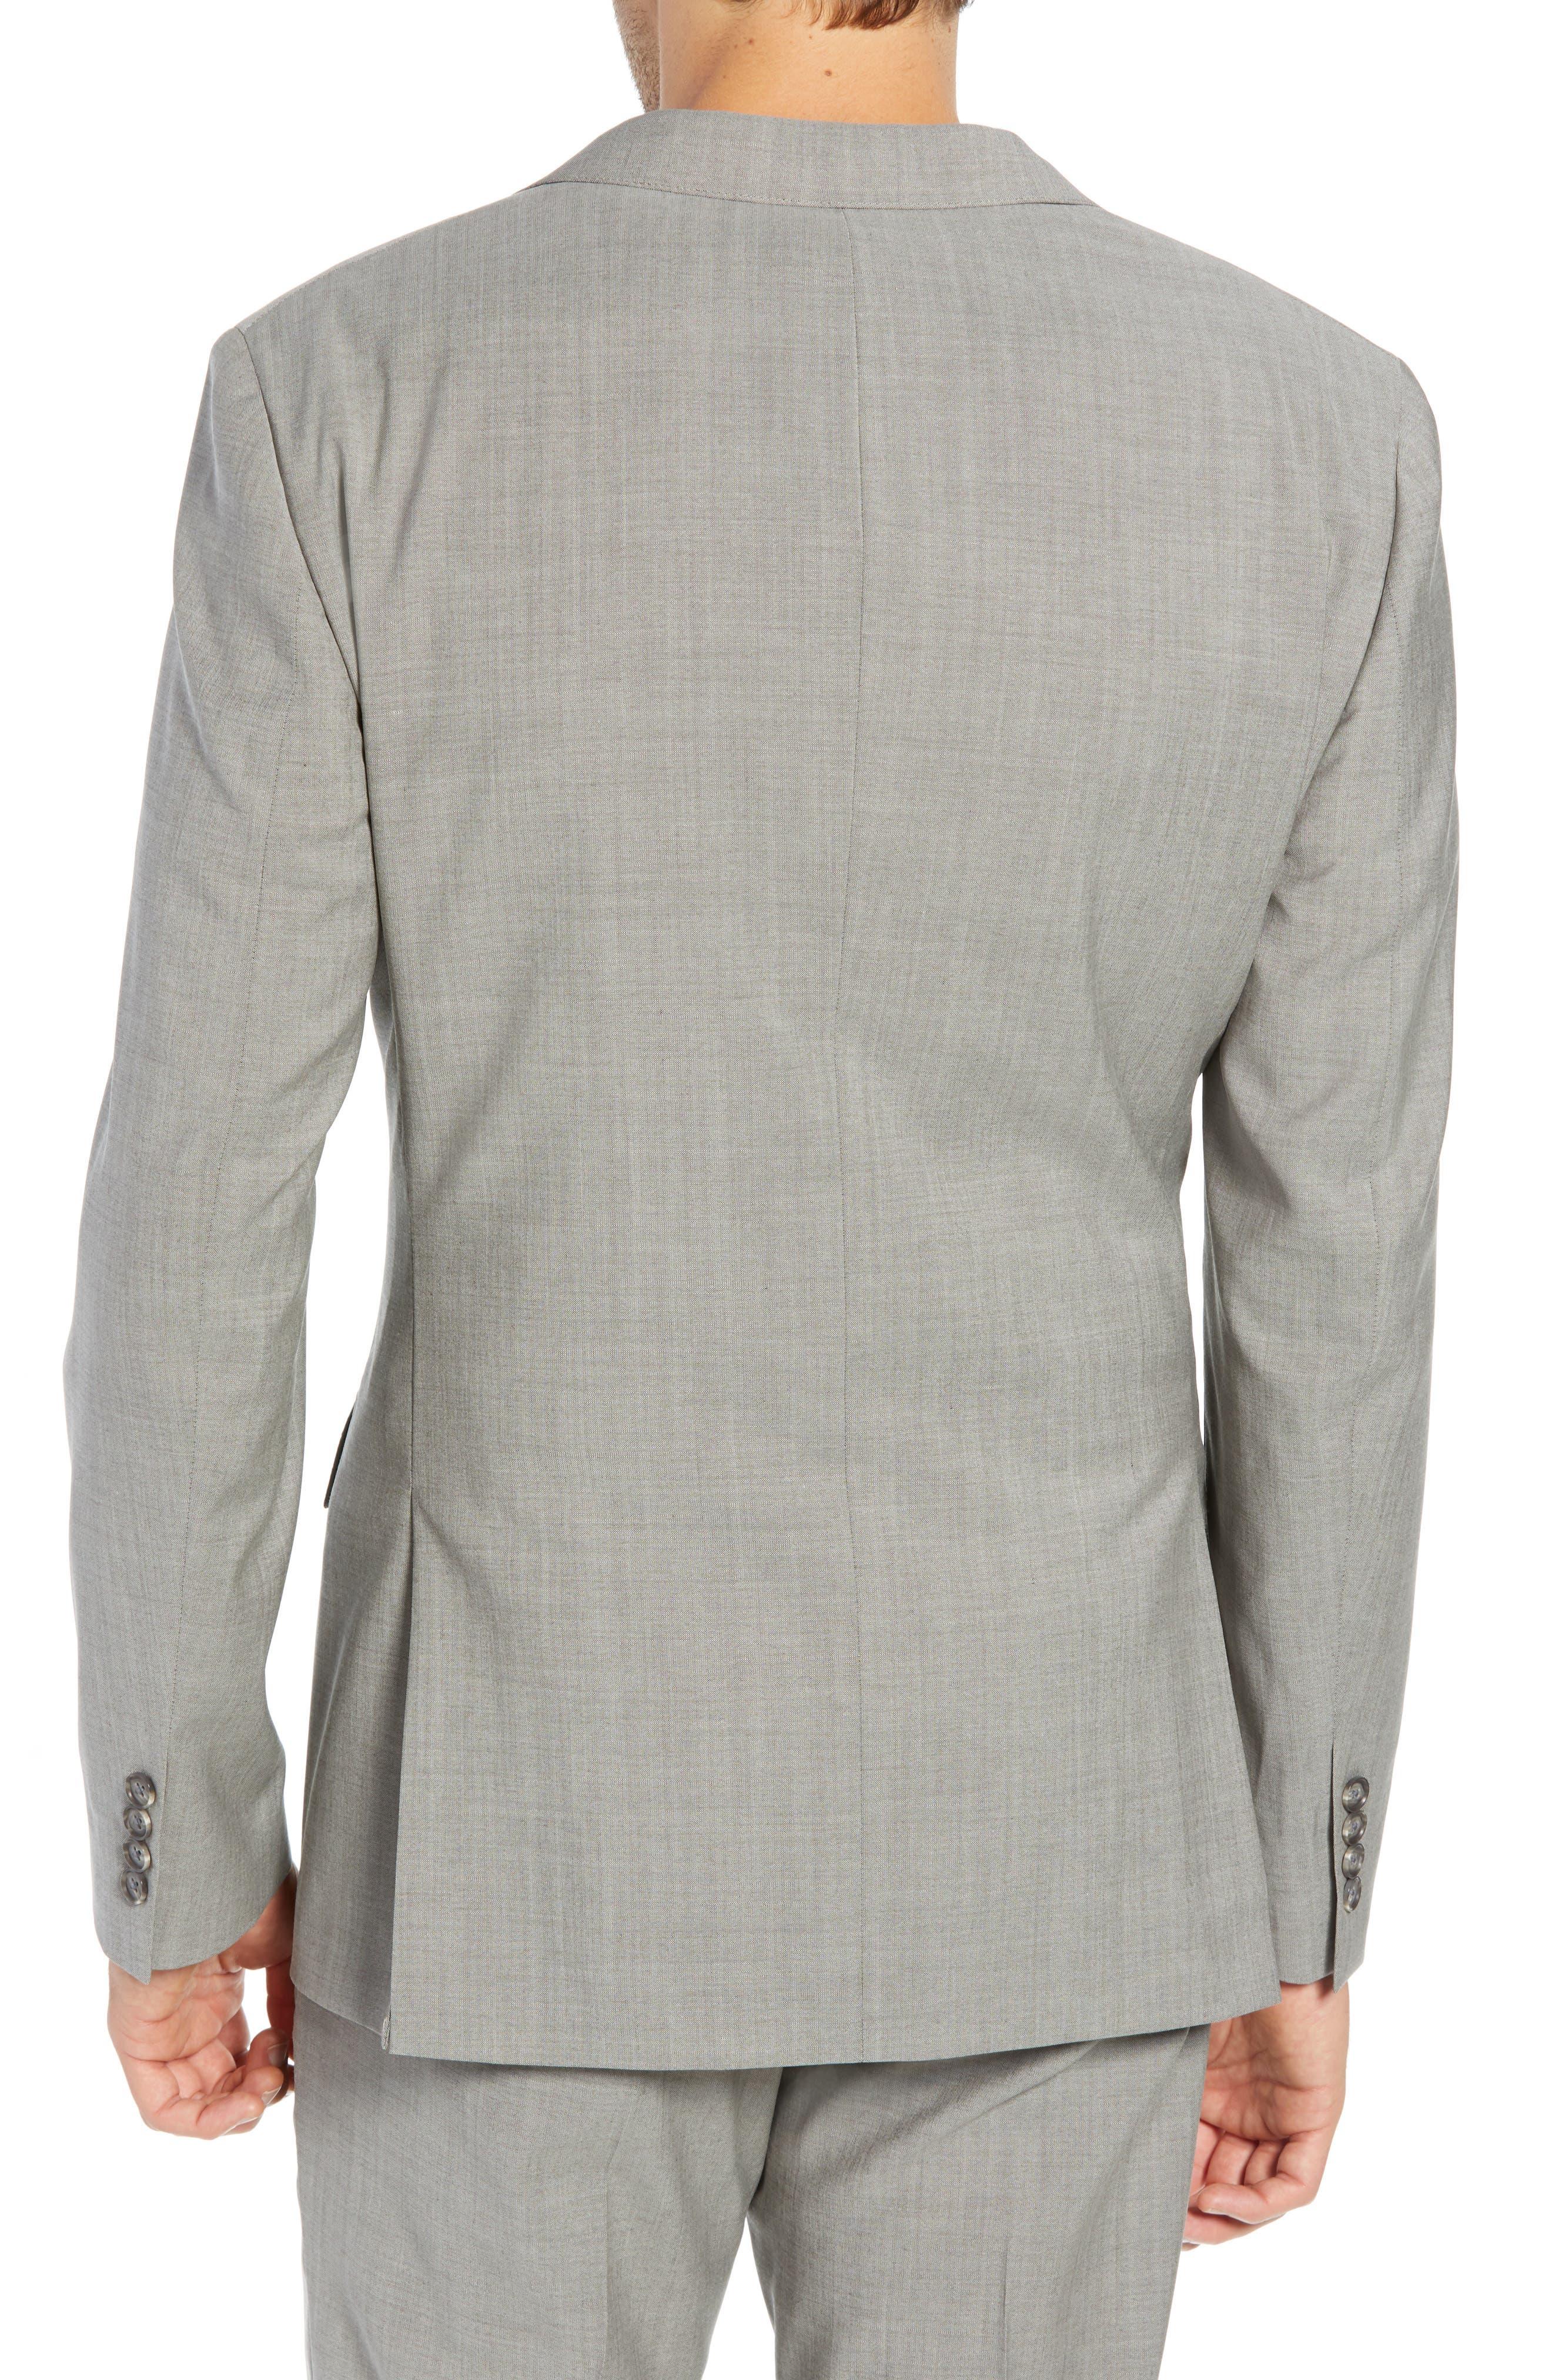 Jetsetter Slim Fit Stretch Wool Blazer,                             Alternate thumbnail 2, color,                             LIGHT BROWN